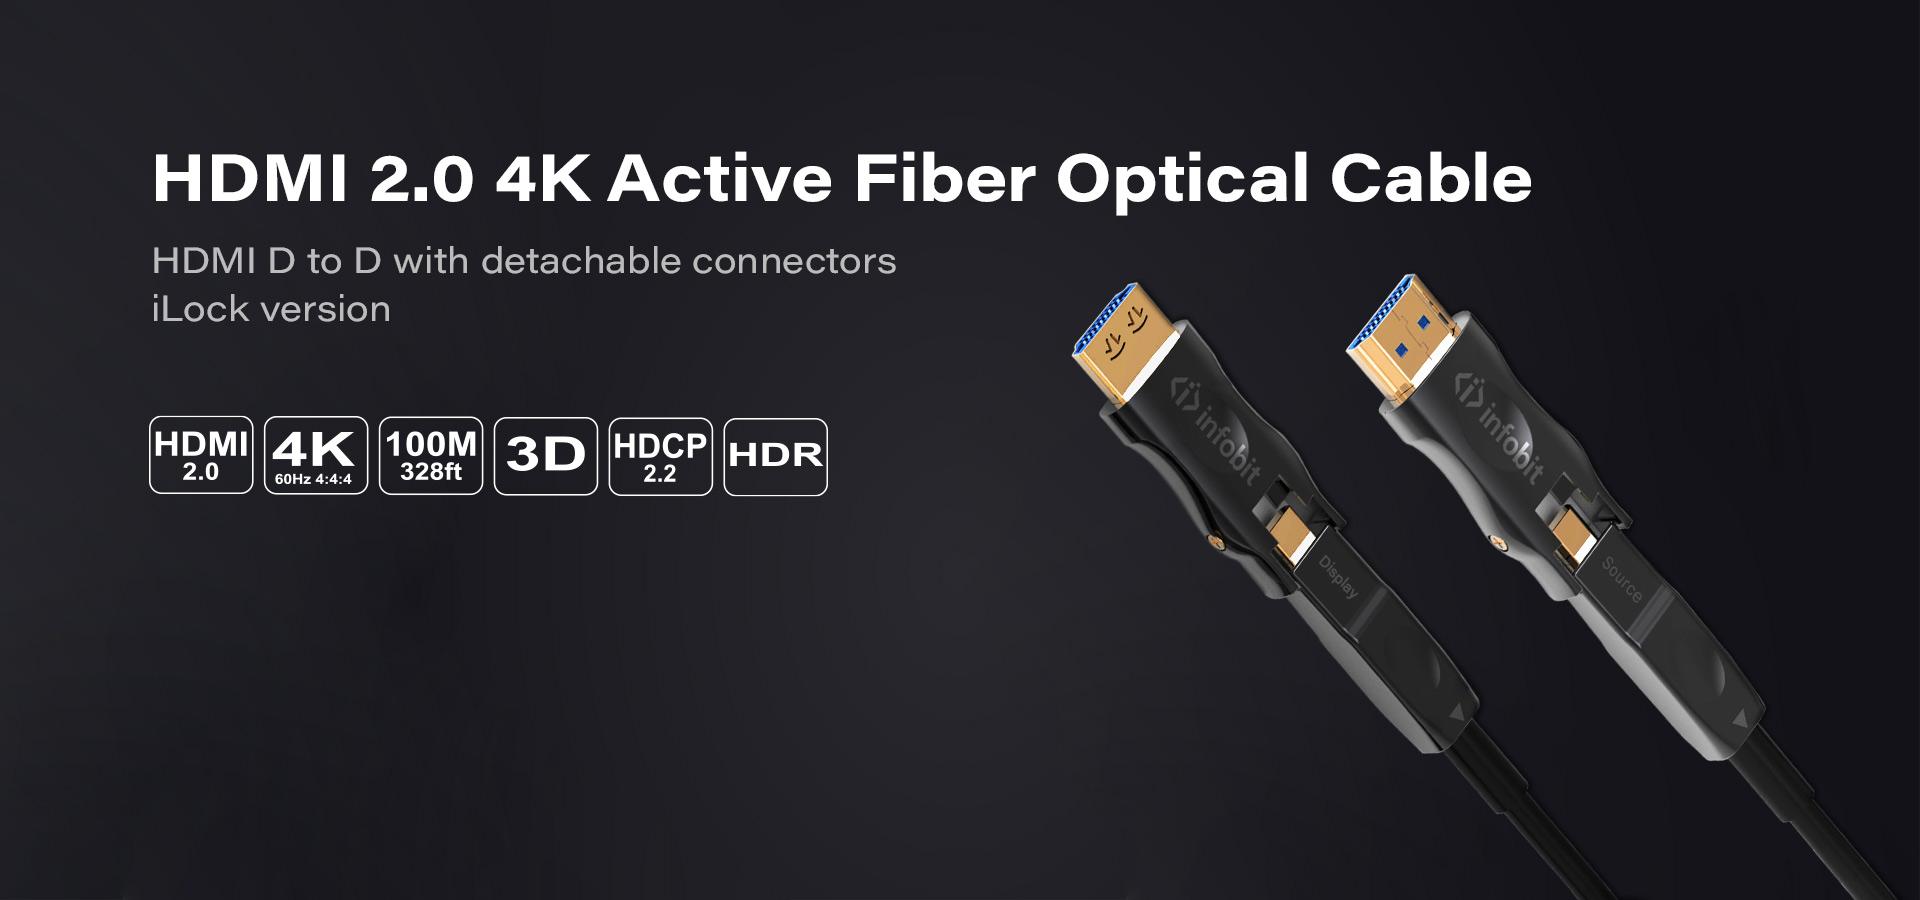 DD: HDMI D to D detachable connectors with iLock